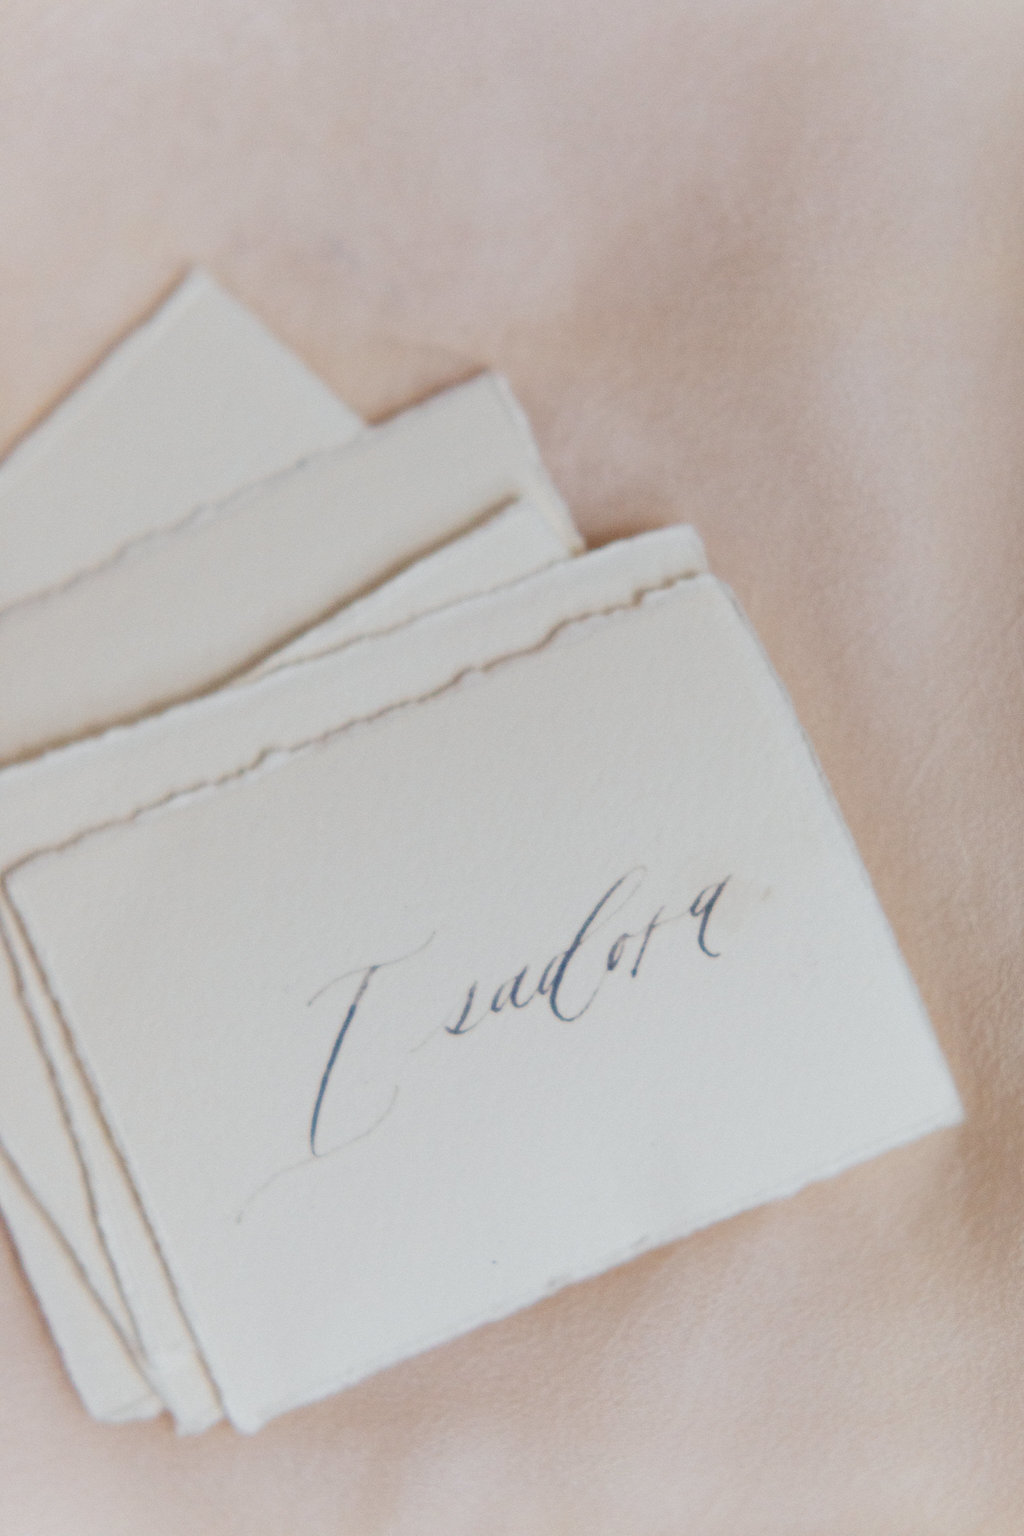 Blush-and-Bowties-Minimalist-Artisinal-Christine-Lim-007.JPG